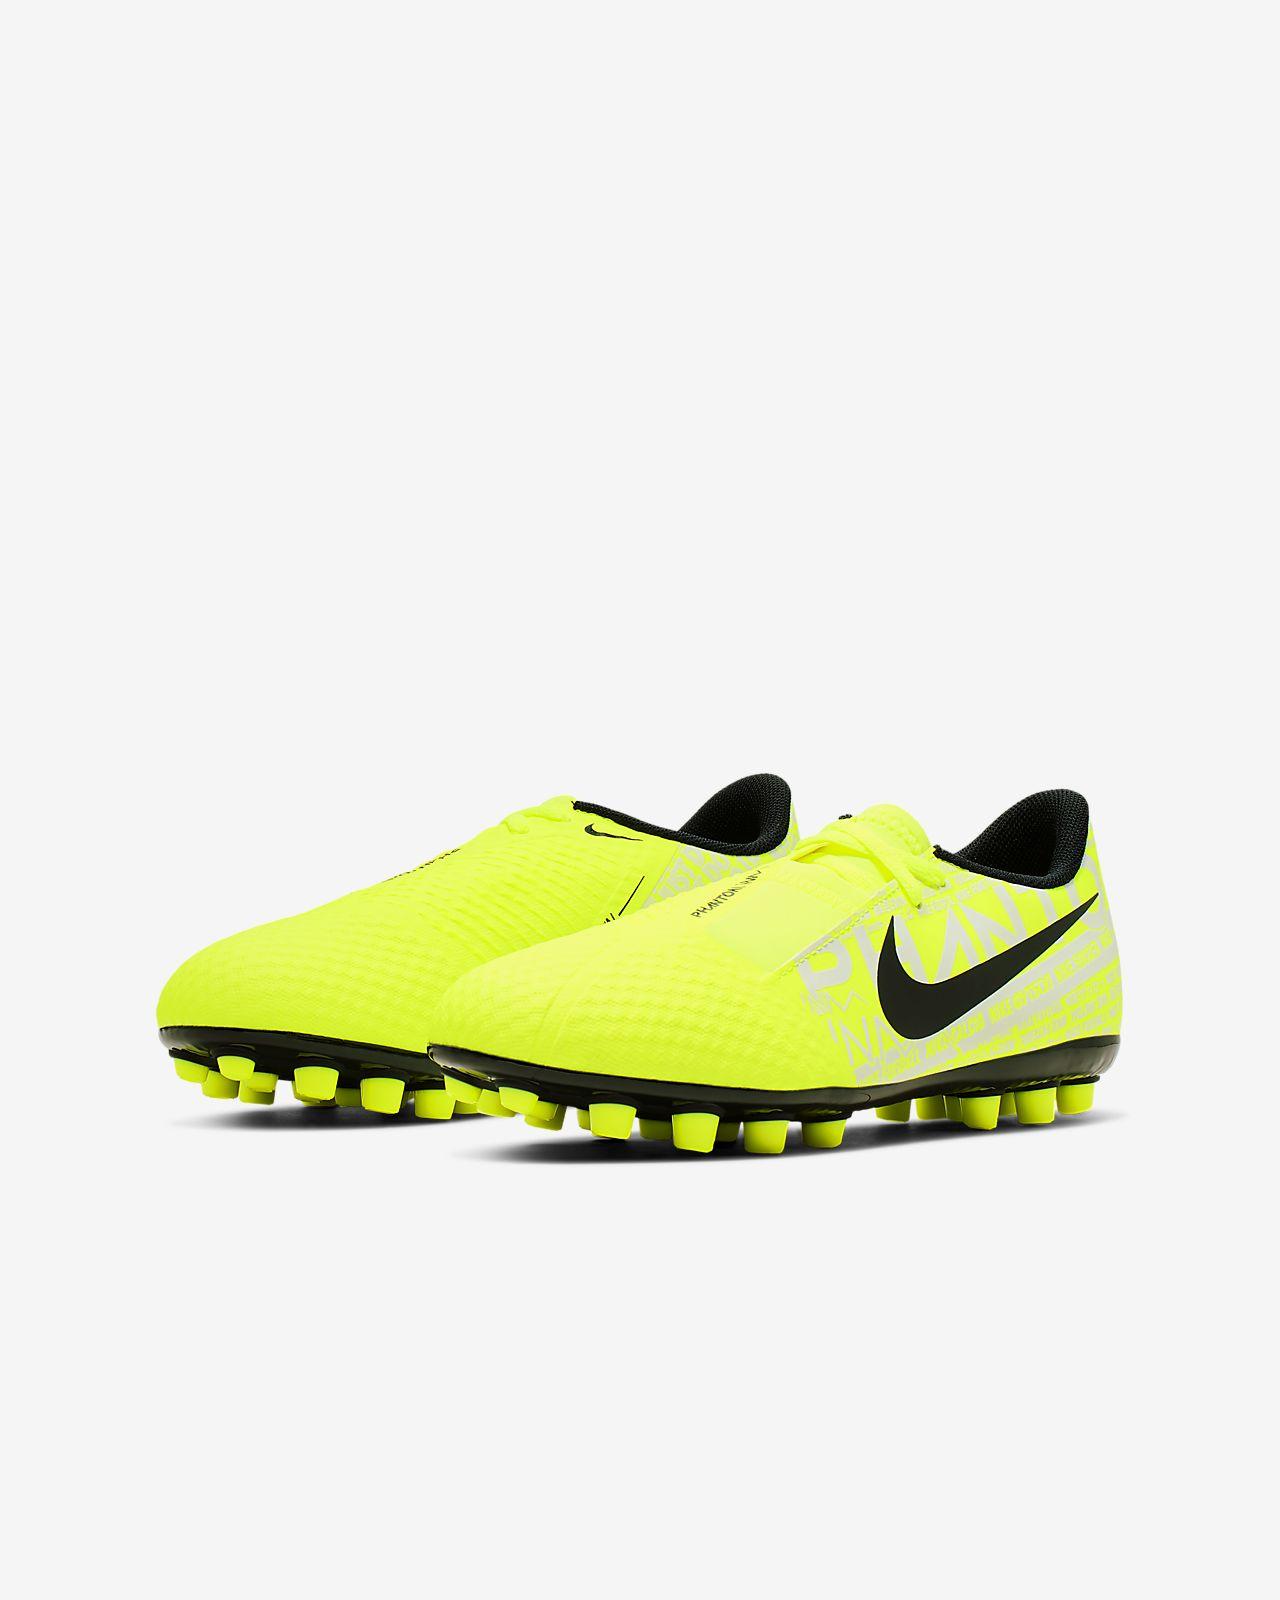 Scarpa da calcio per erba artificiale Nike Jr. Phantom Venom Academy AG BambiniRagazzi